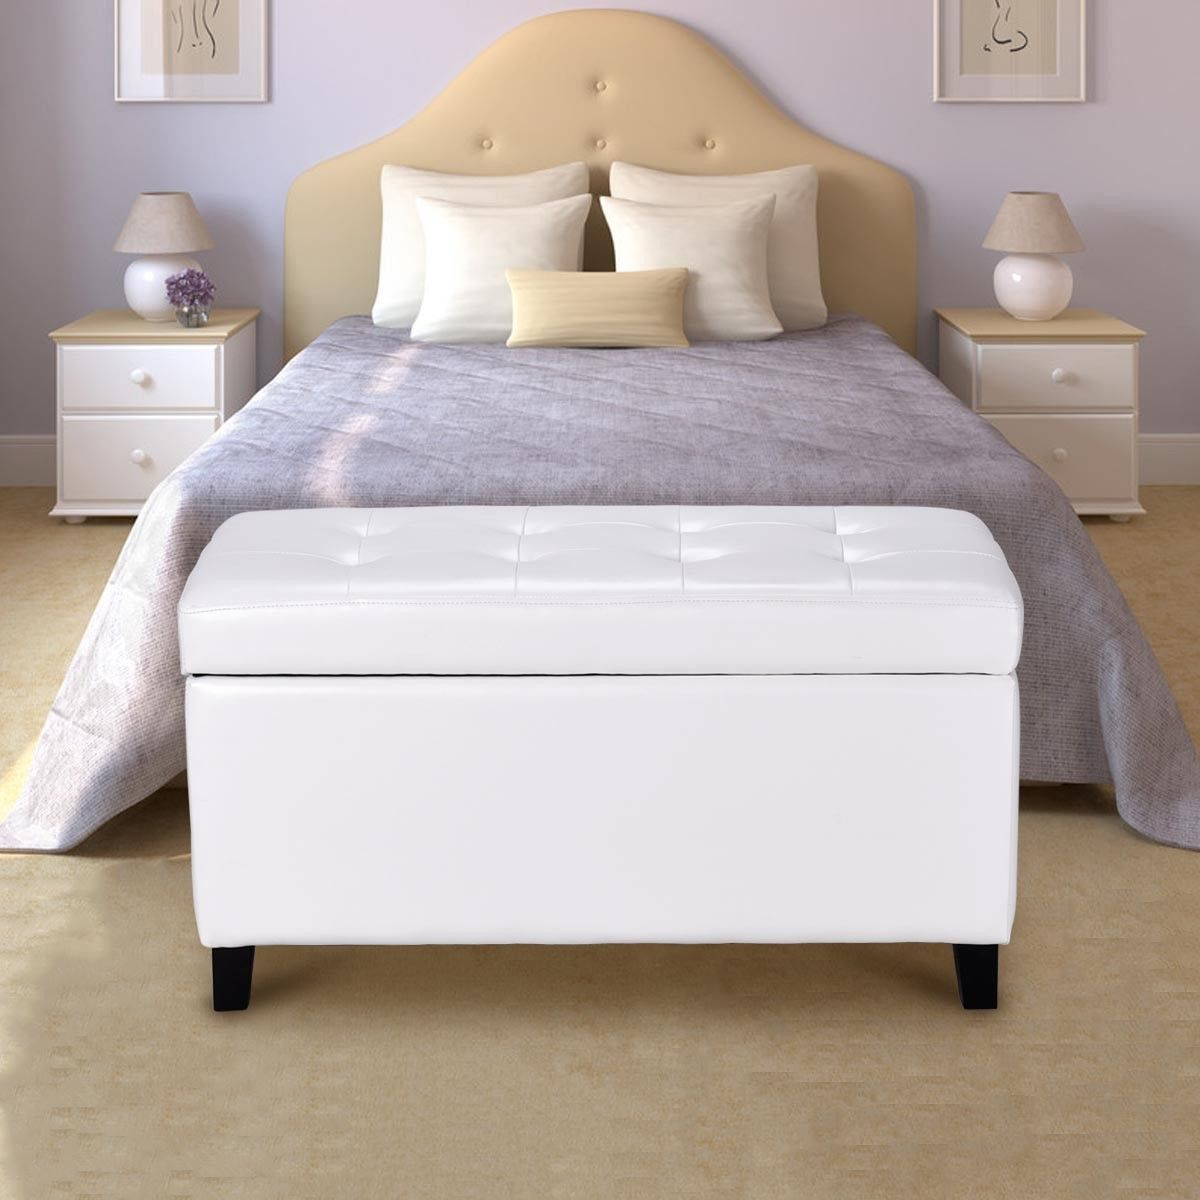 Giantex 33.5\'\' Living Room Storage Ottoman Bench Modern Single ...